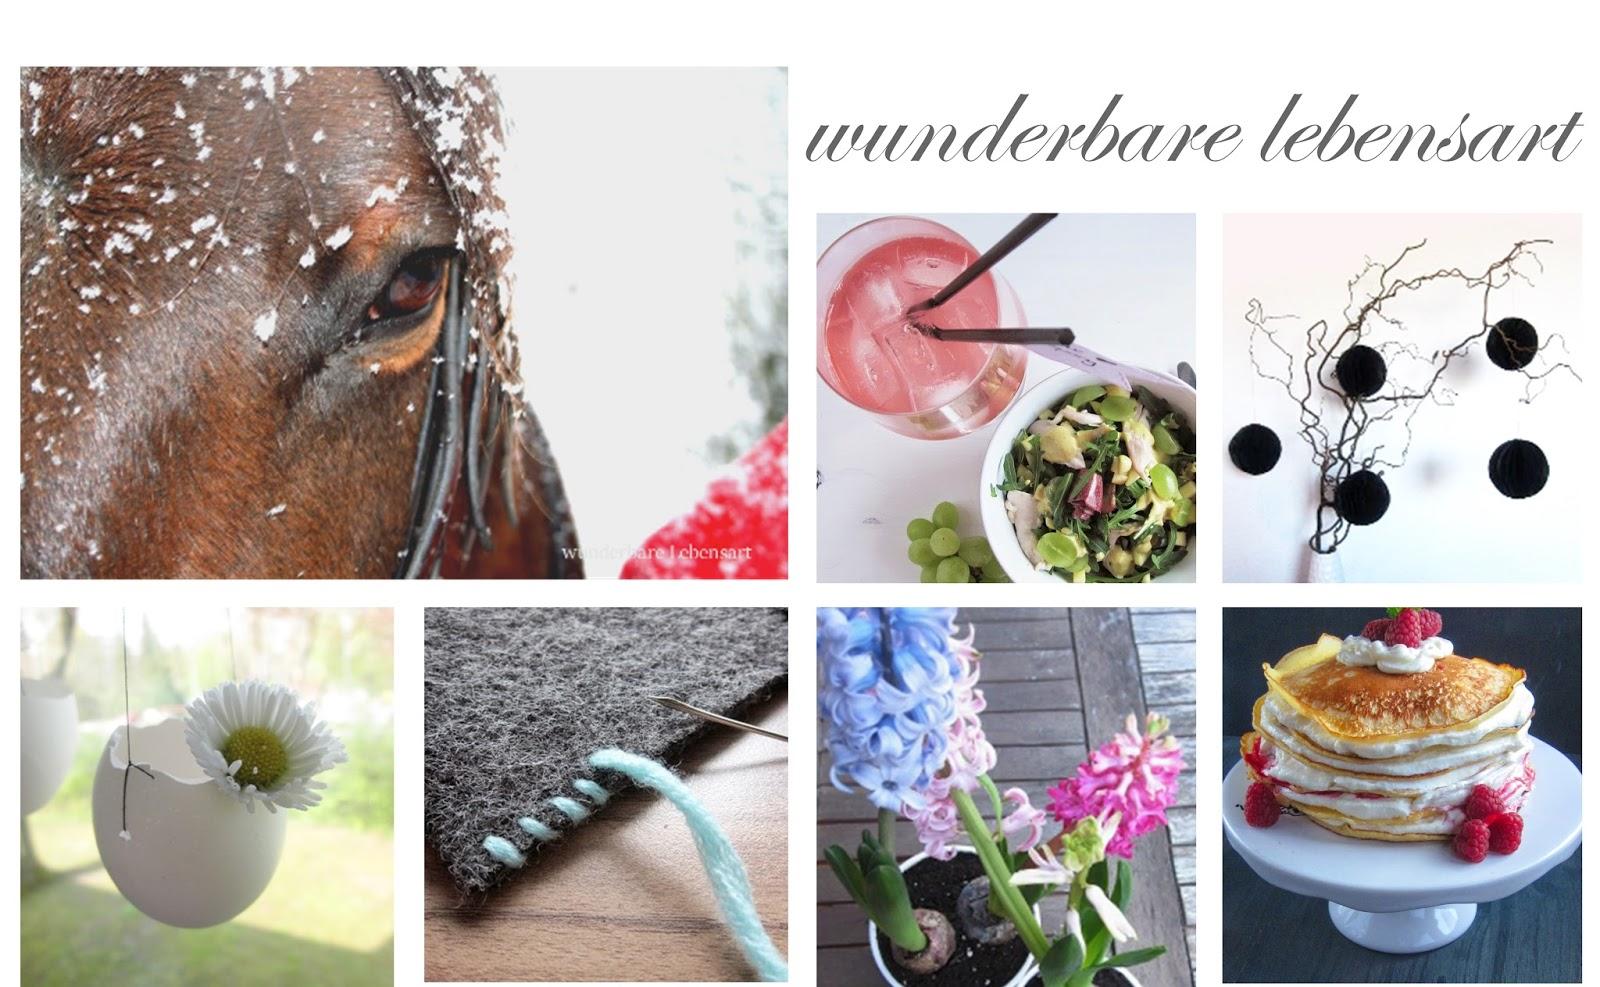 http://wunderbarelebensart.blogspot.de/